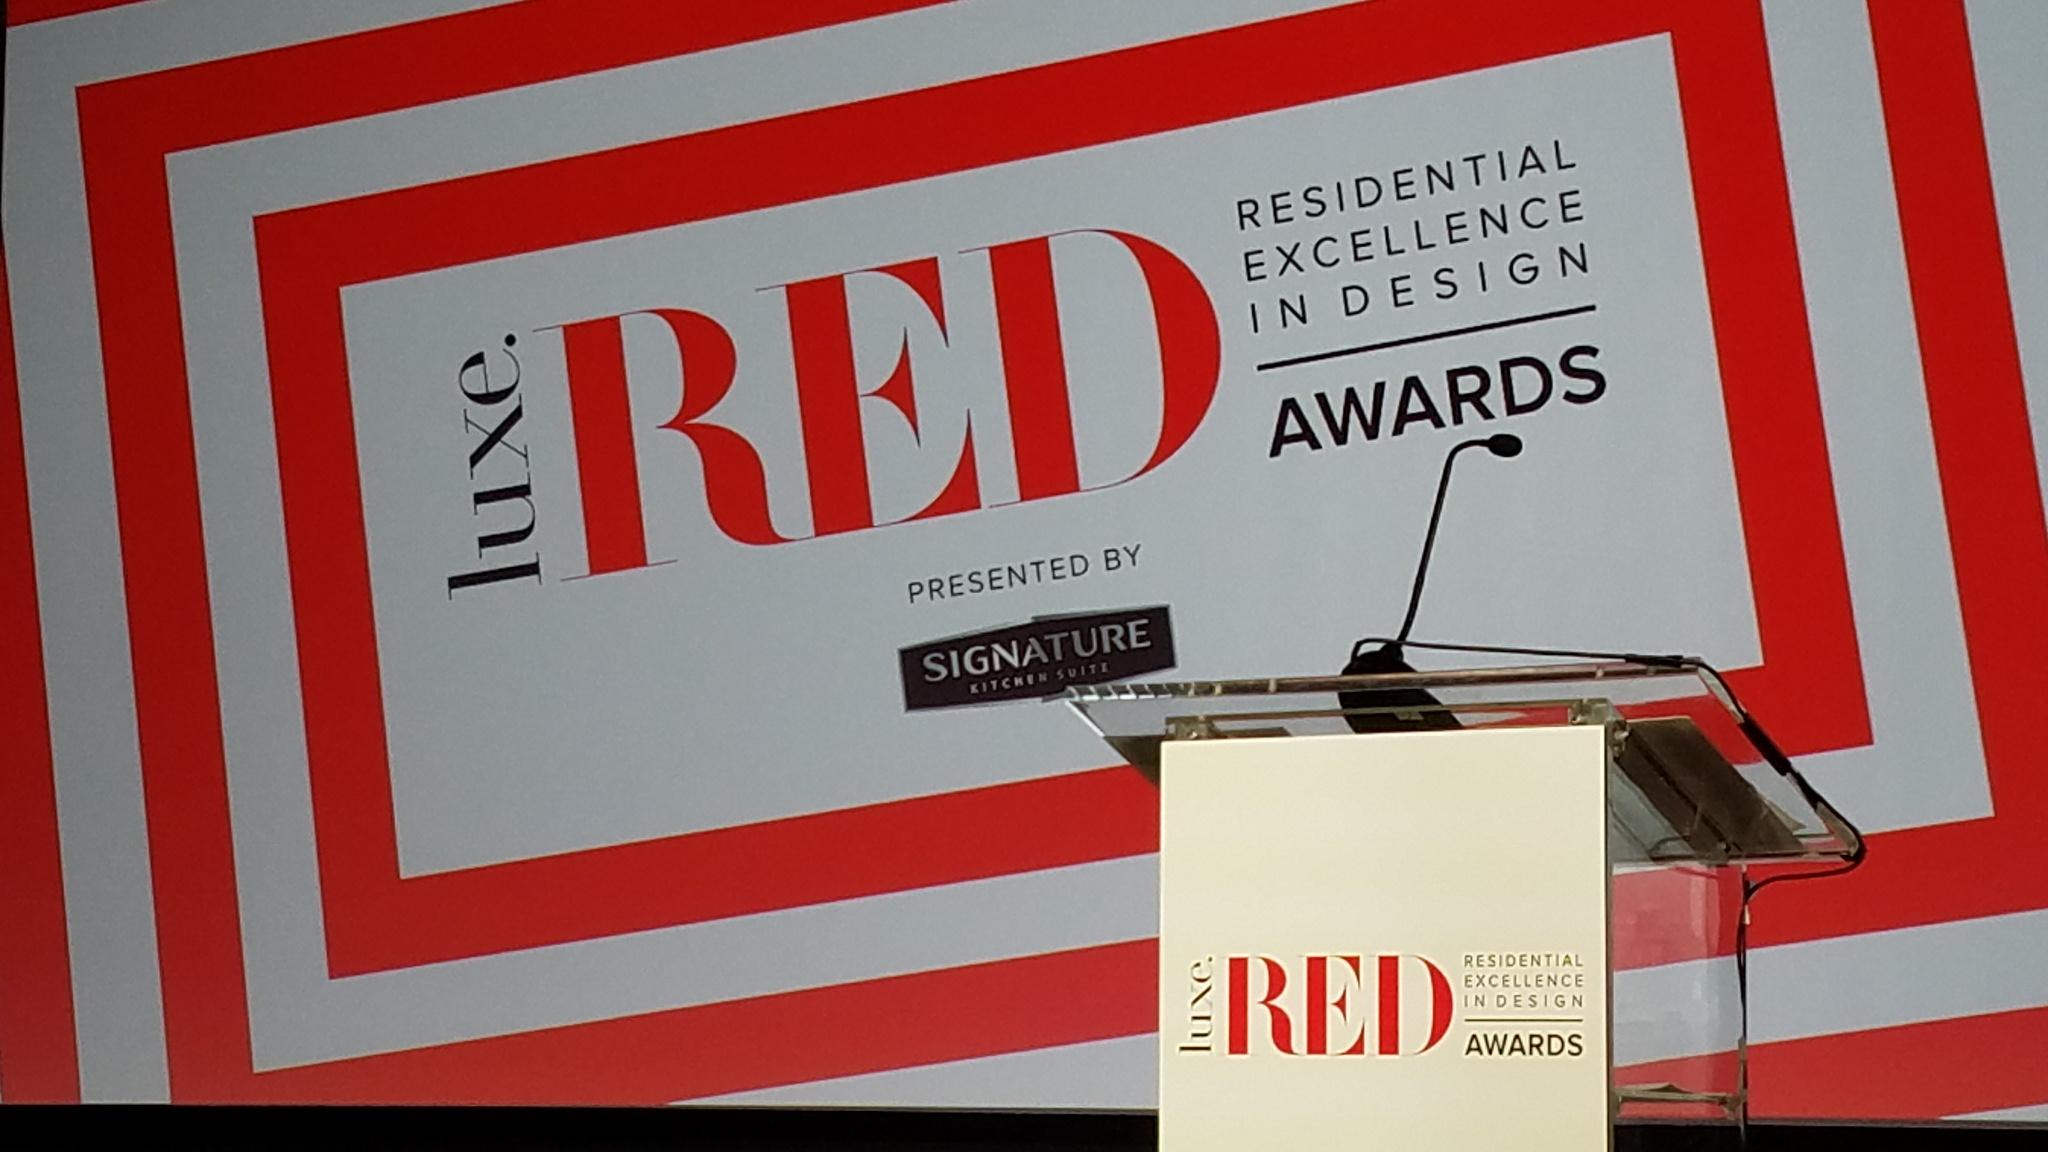 LUXE RED Awards: Rangers Ridge Wins Regional Award